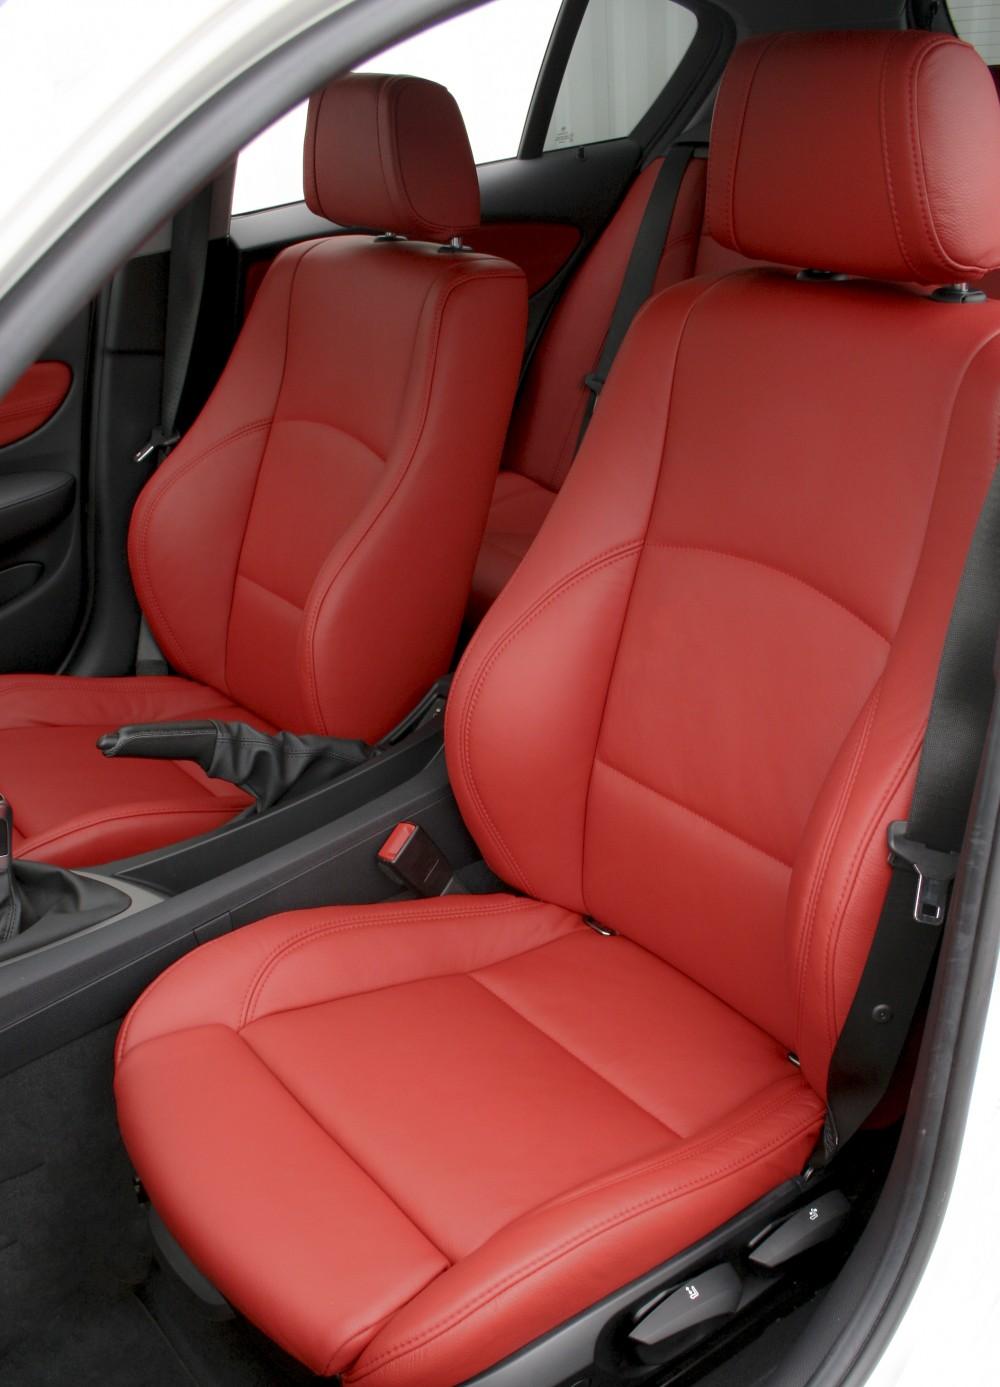 BMW E87 Sport NL Dakota Coral Red Leather Trim Technik